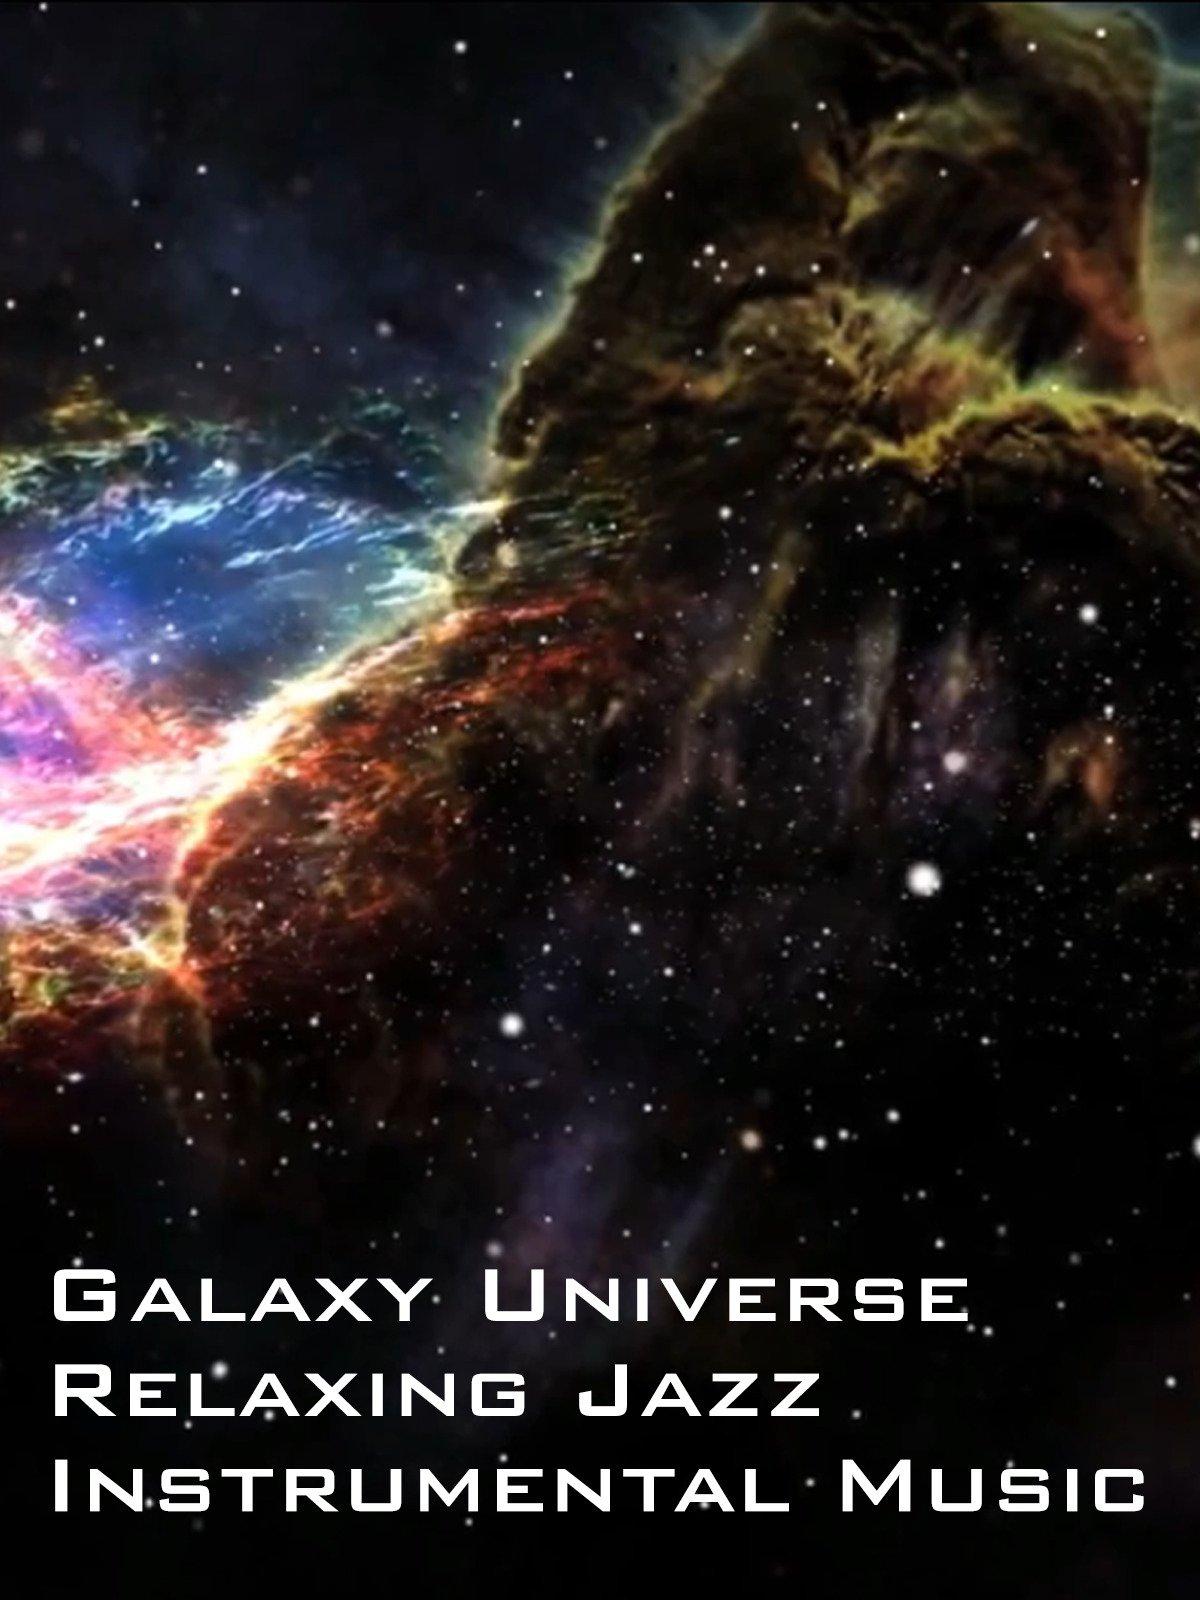 Galaxy Universe Relaxing Jazz Instrumental Music